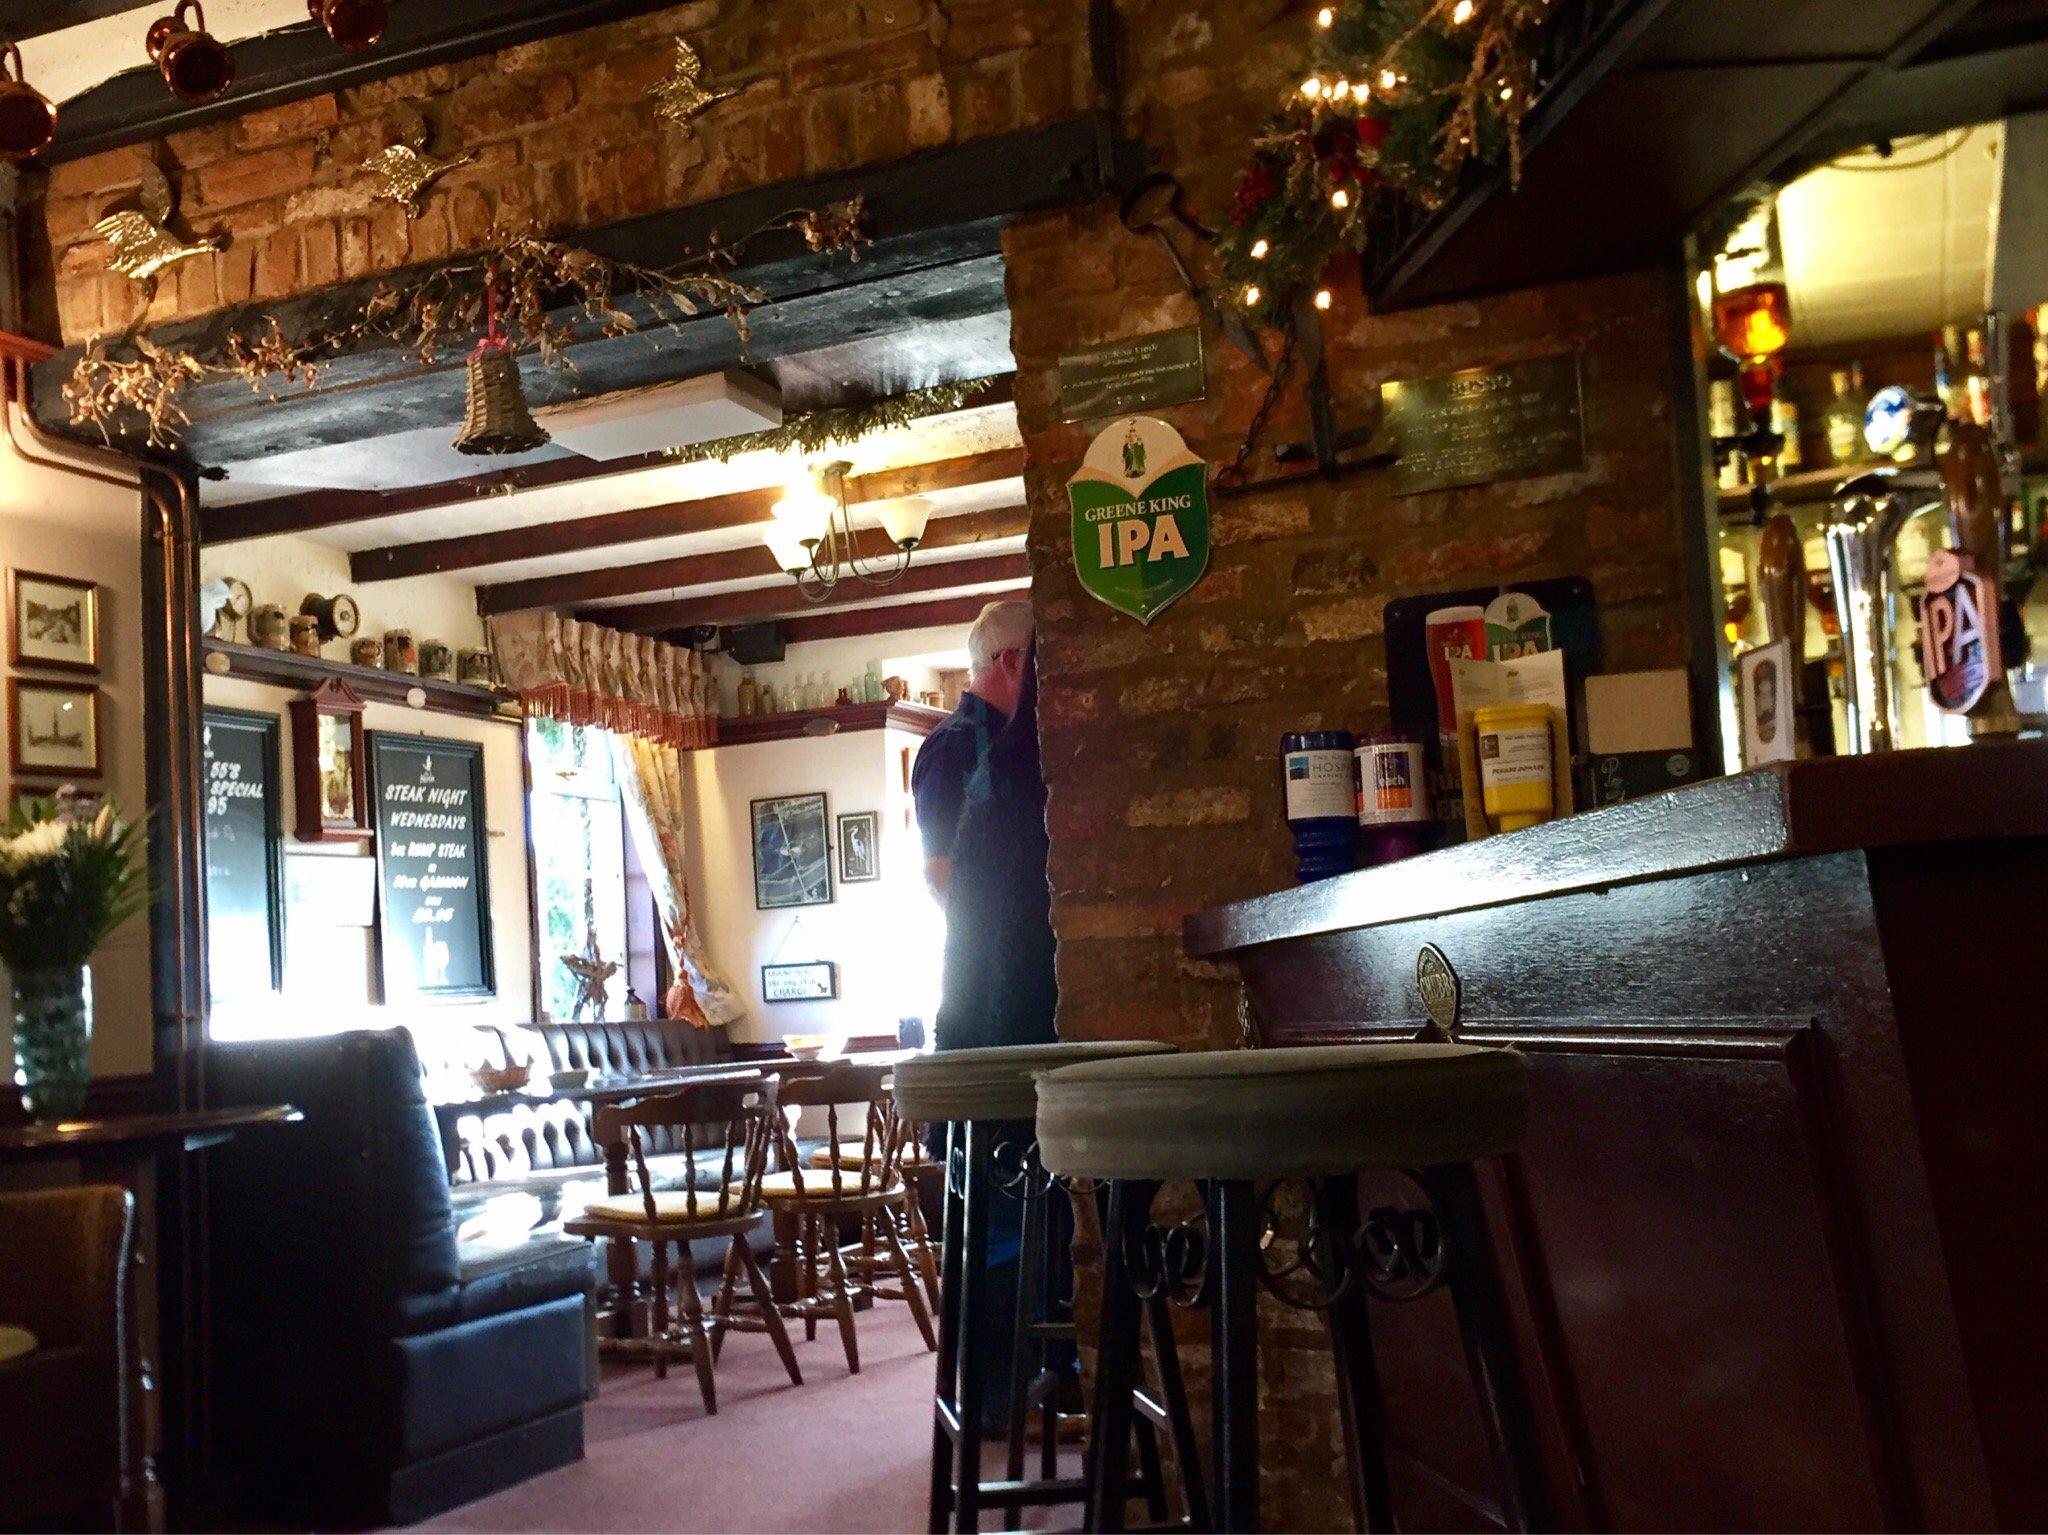 Restaurants The Heron Public House in Kings Lynn and West Norfolk